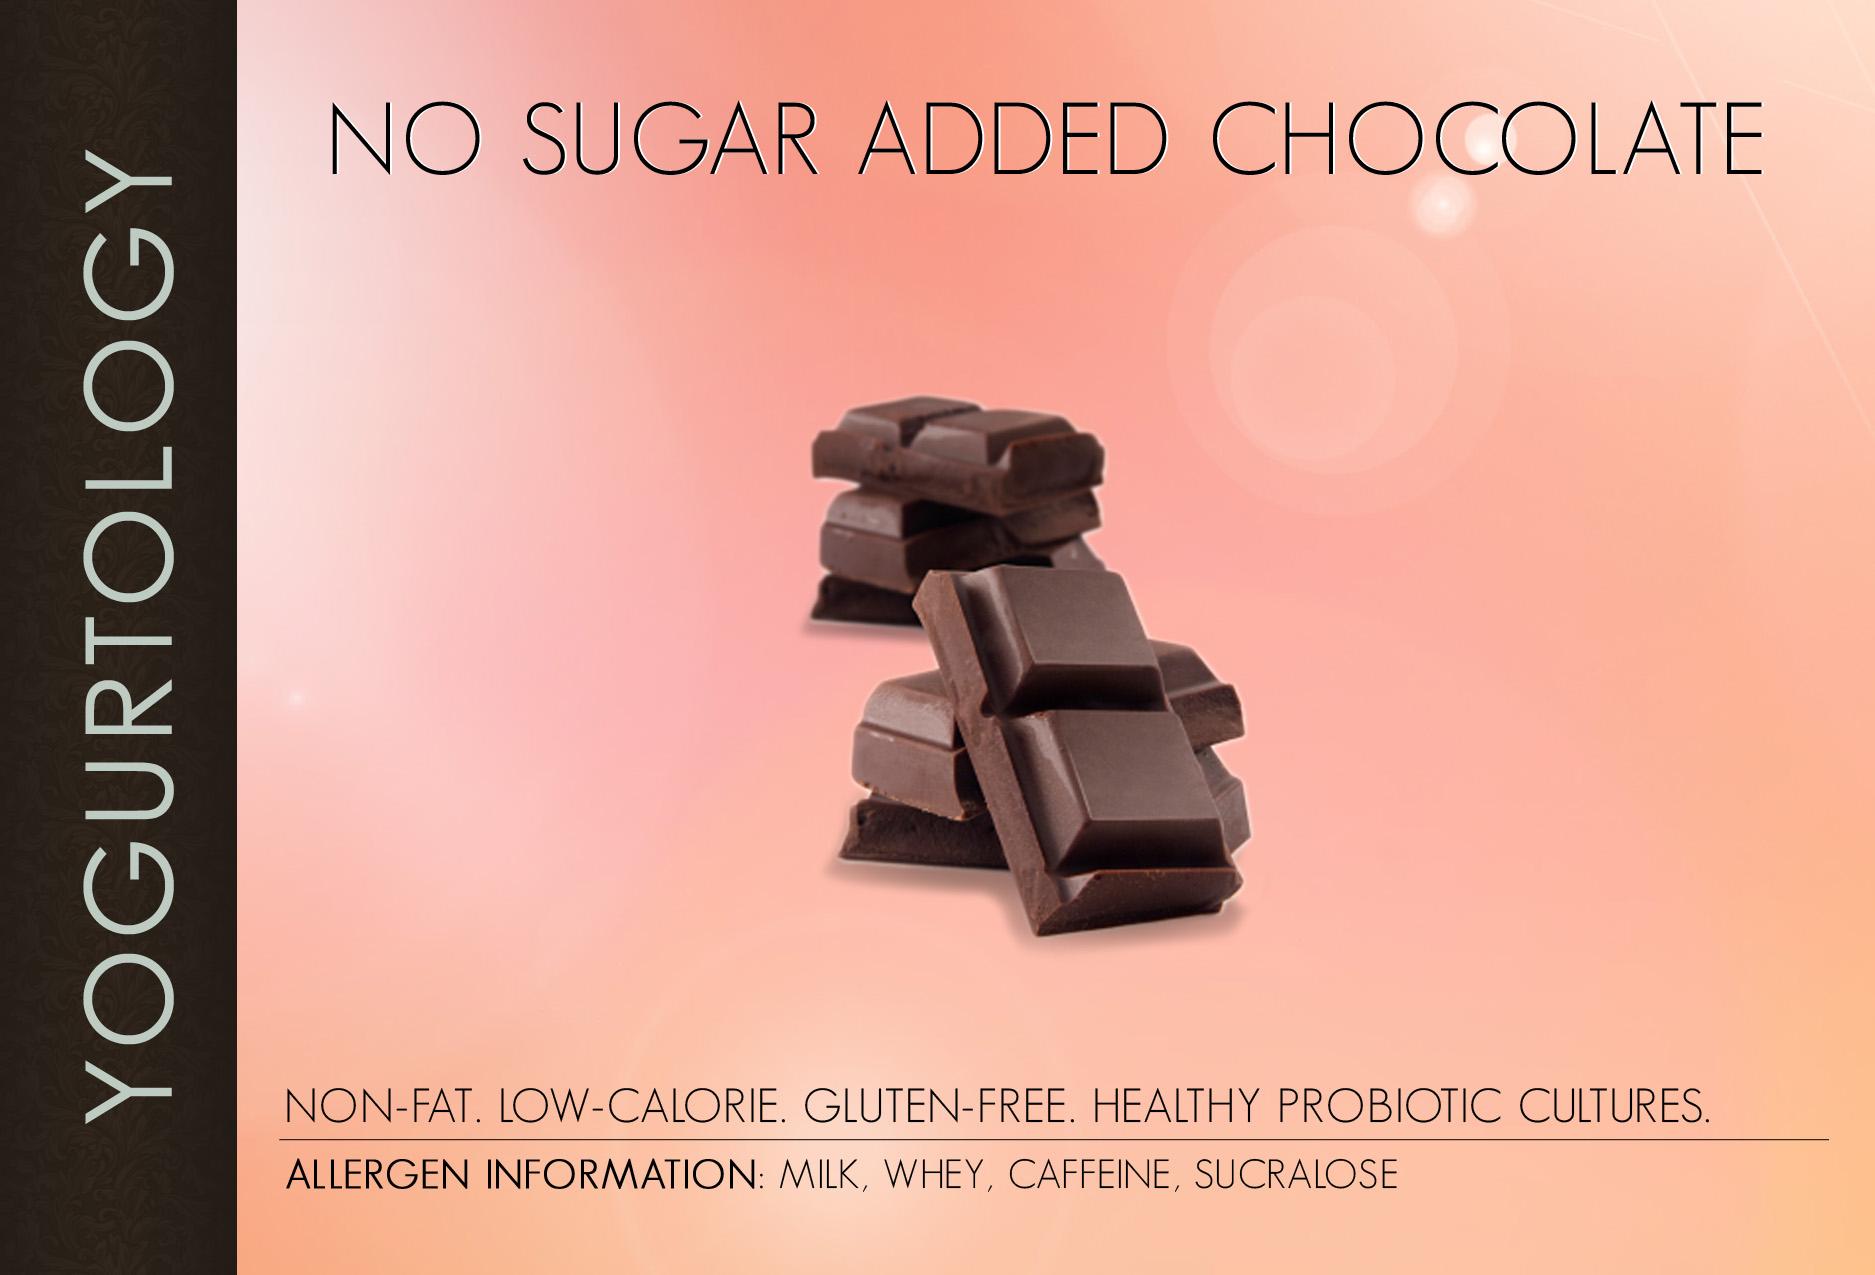 NSA Chocolate